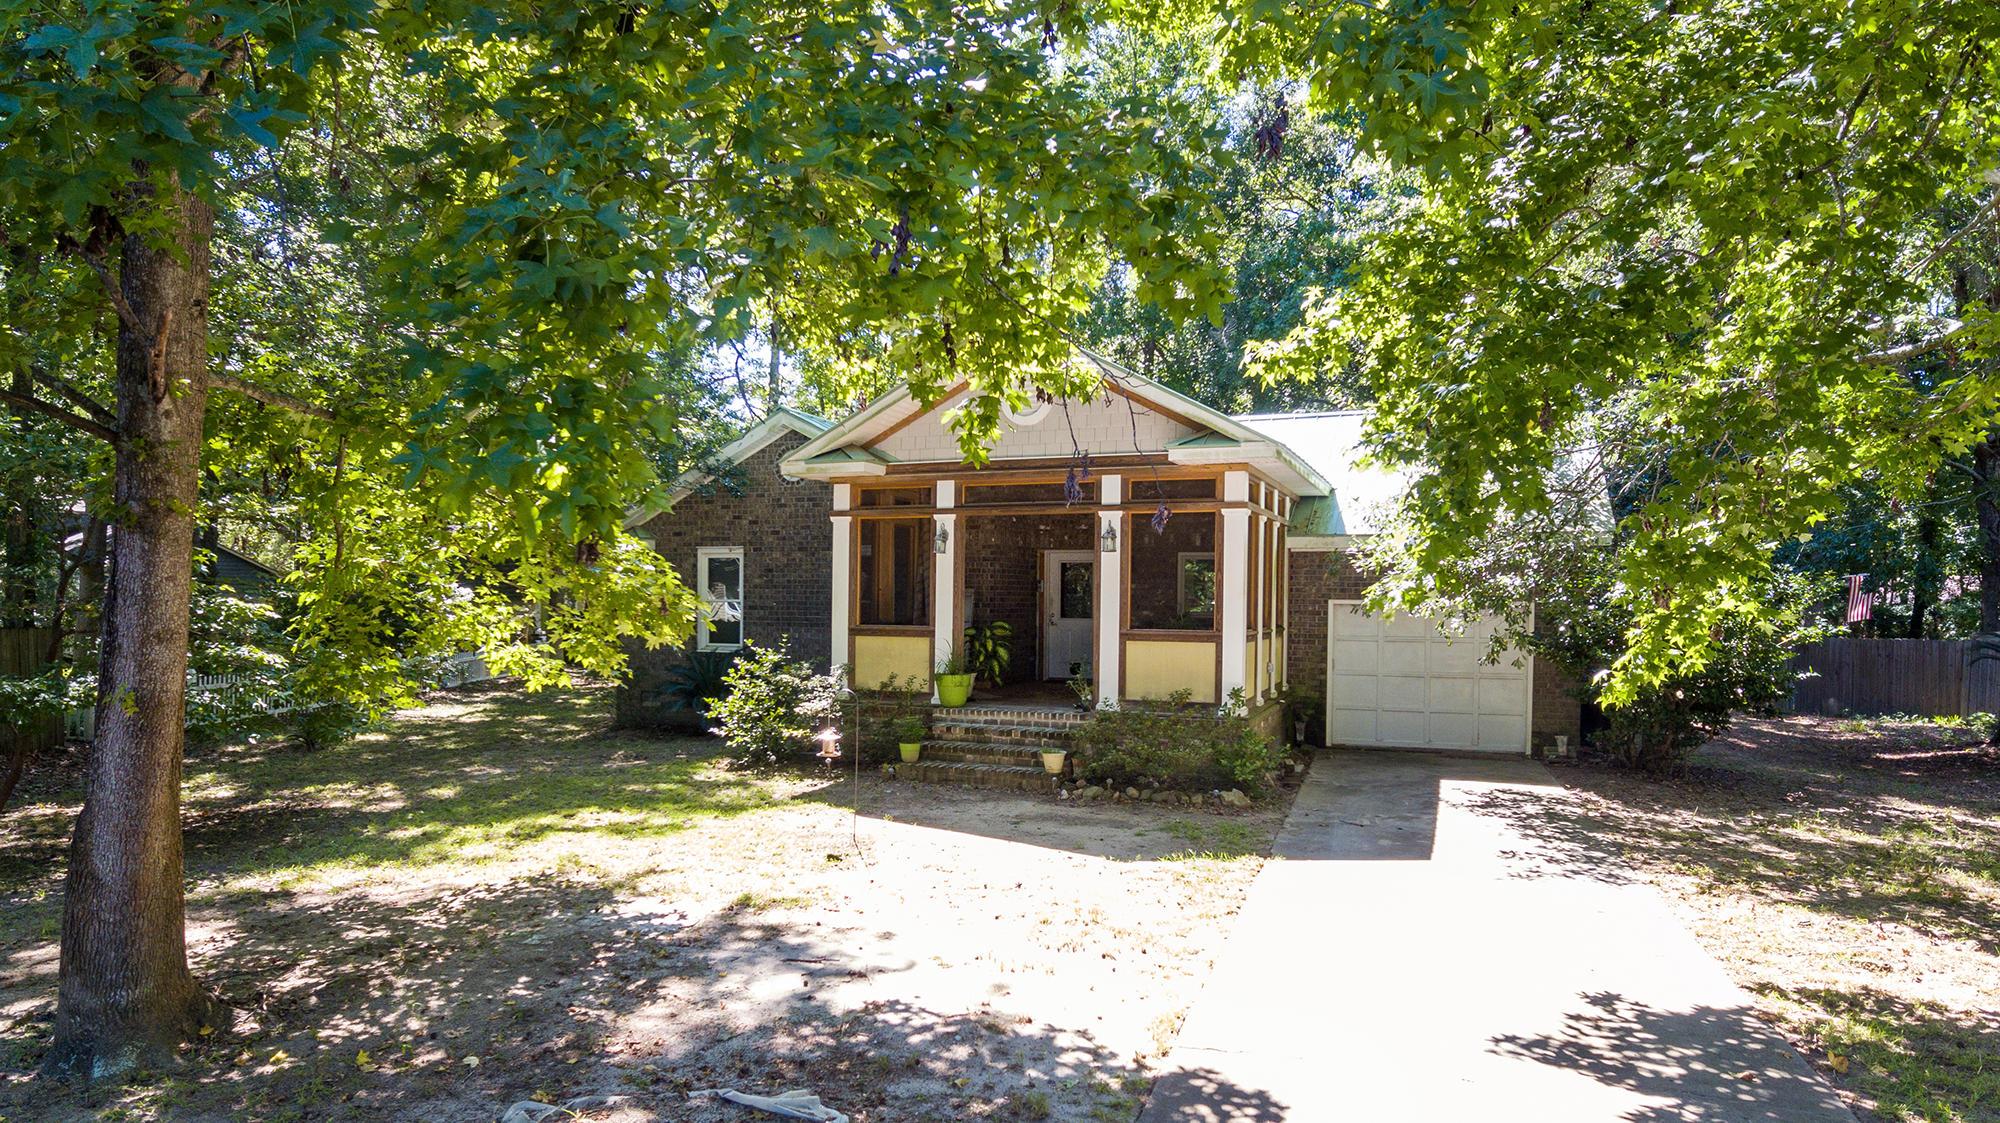 Wando Lakes Homes For Sale - 858 Fairlawn, Mount Pleasant, SC - 1